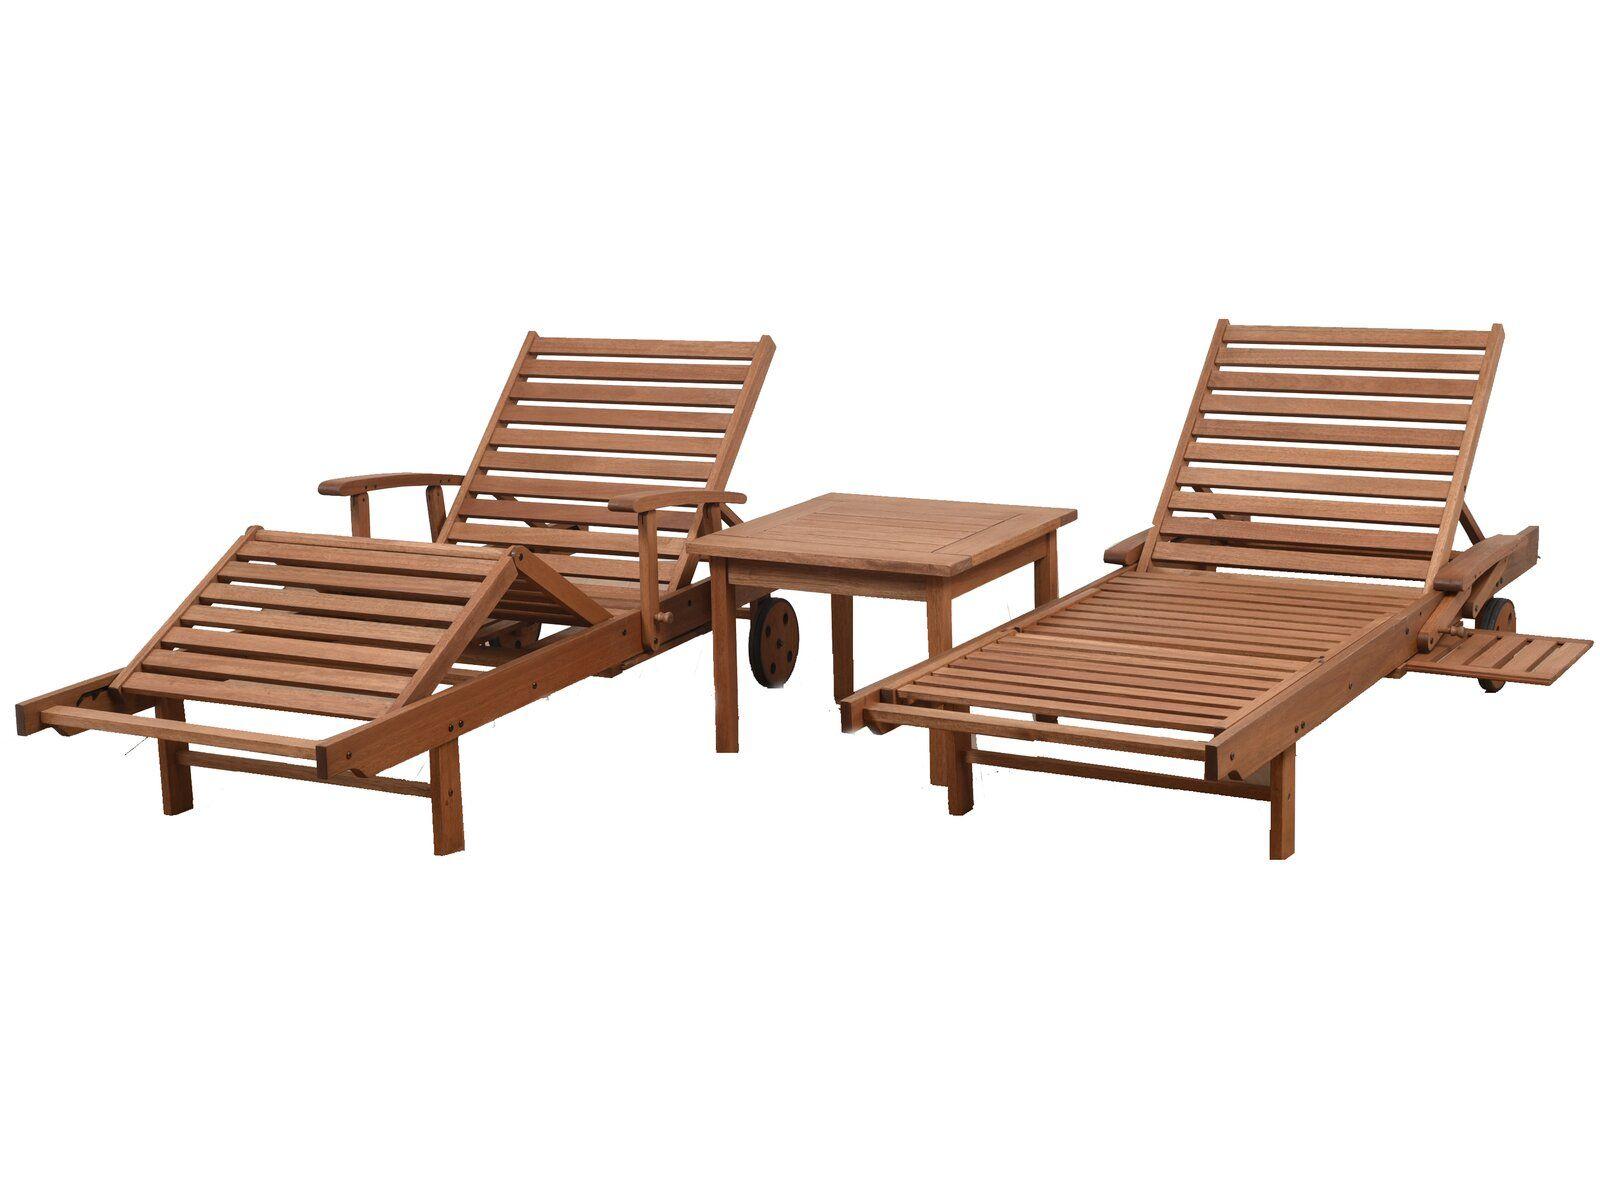 Newbury Patio 3 Piece Single Reclining Chaise Lounge Set Teak